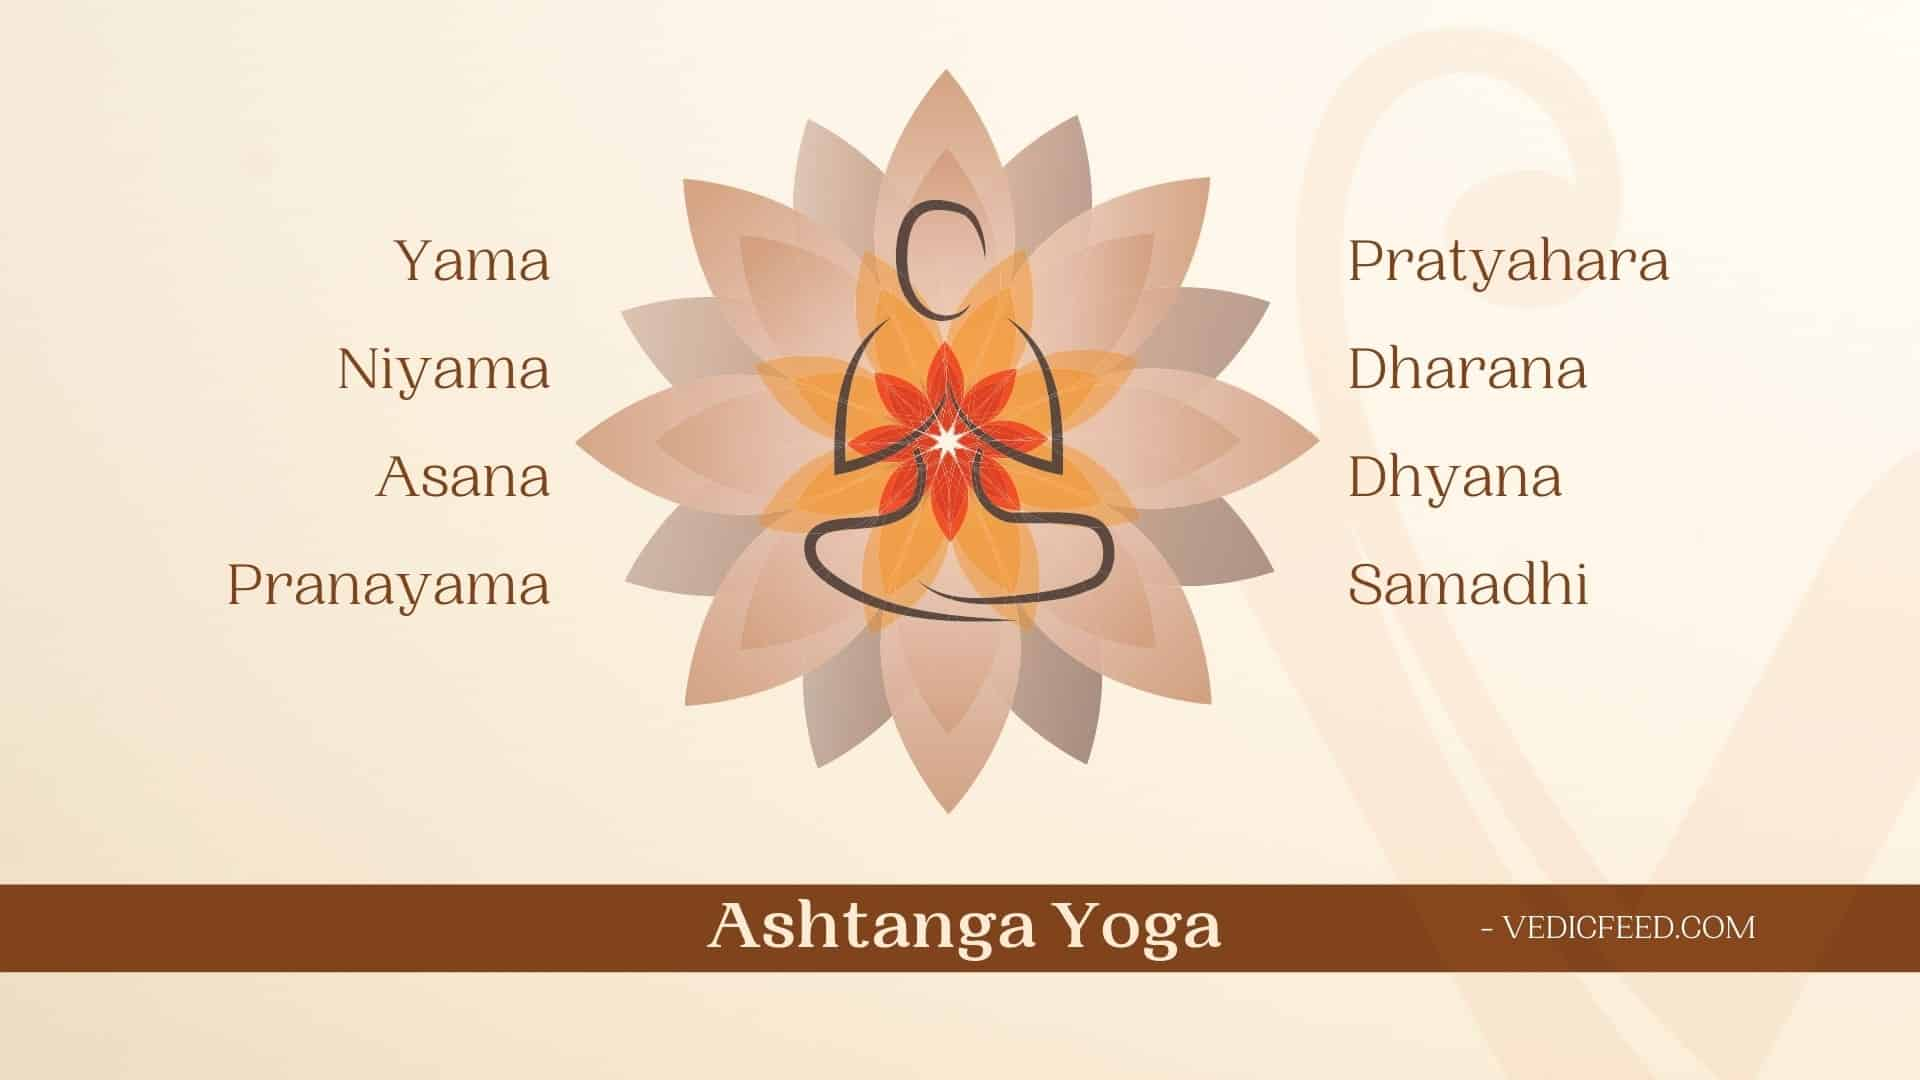 Ashtanga Yoga - 8 Limbs of Yoga